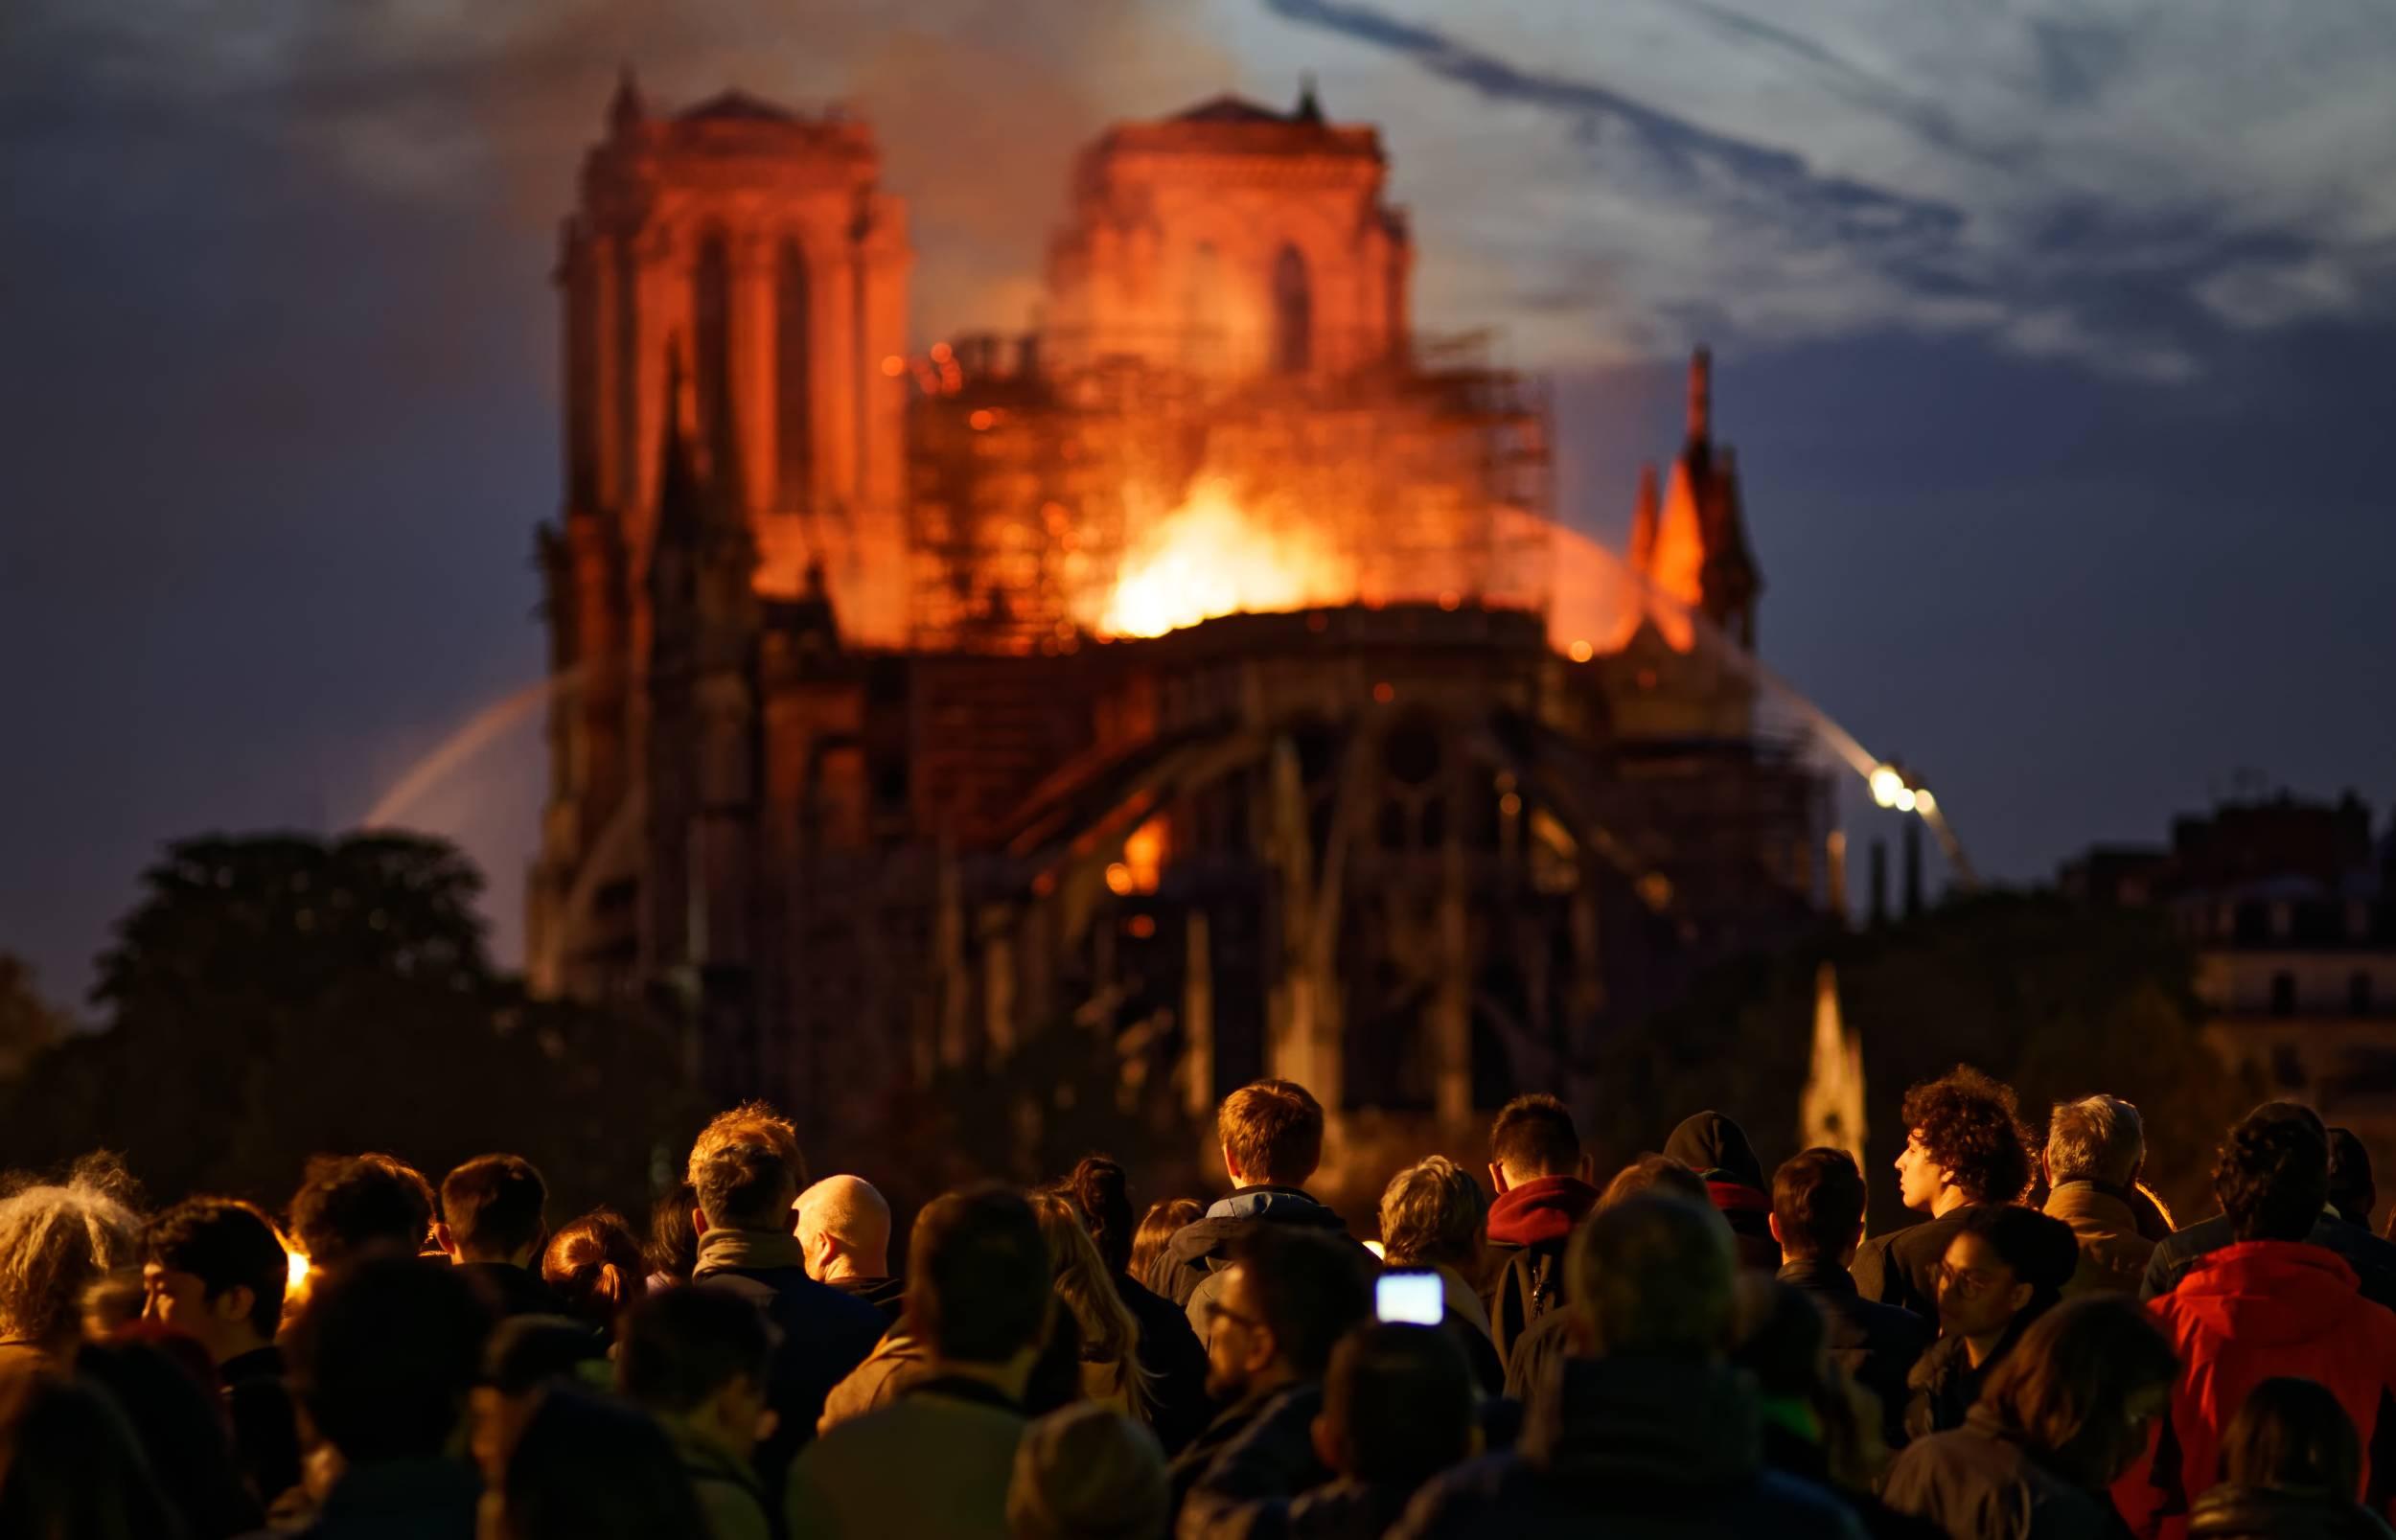 Cathedrale Notre-Dame de Paris © Olivier Mabelly 2